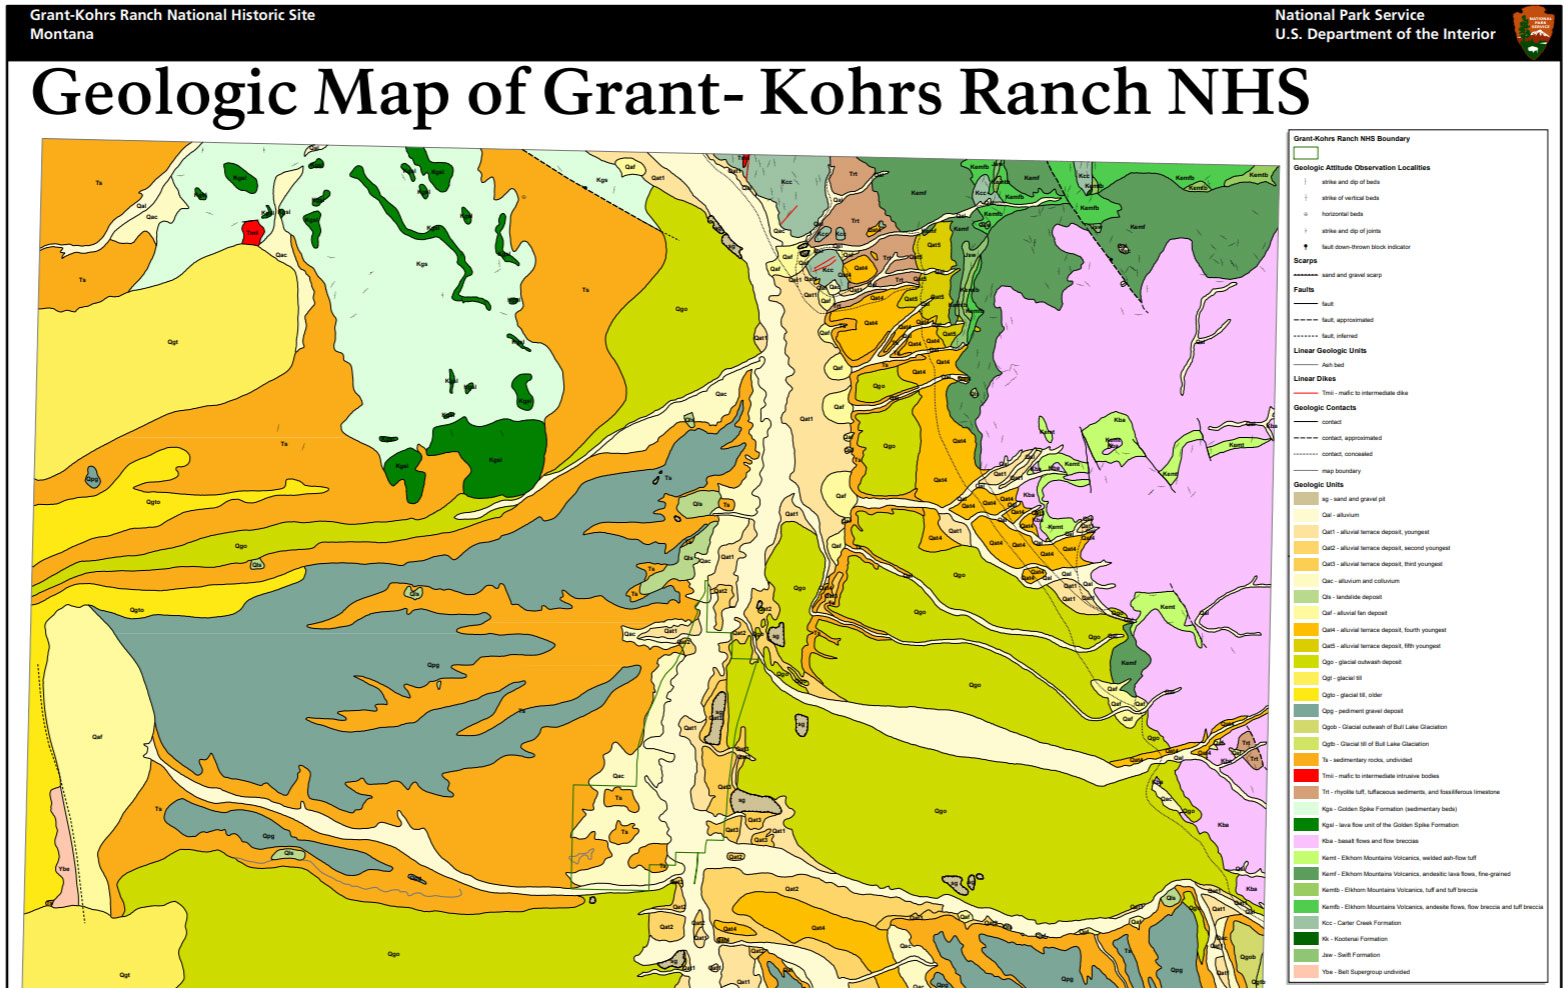 Nps Geodiversity Atlas Grant Kohrs Ranch National Historic Site